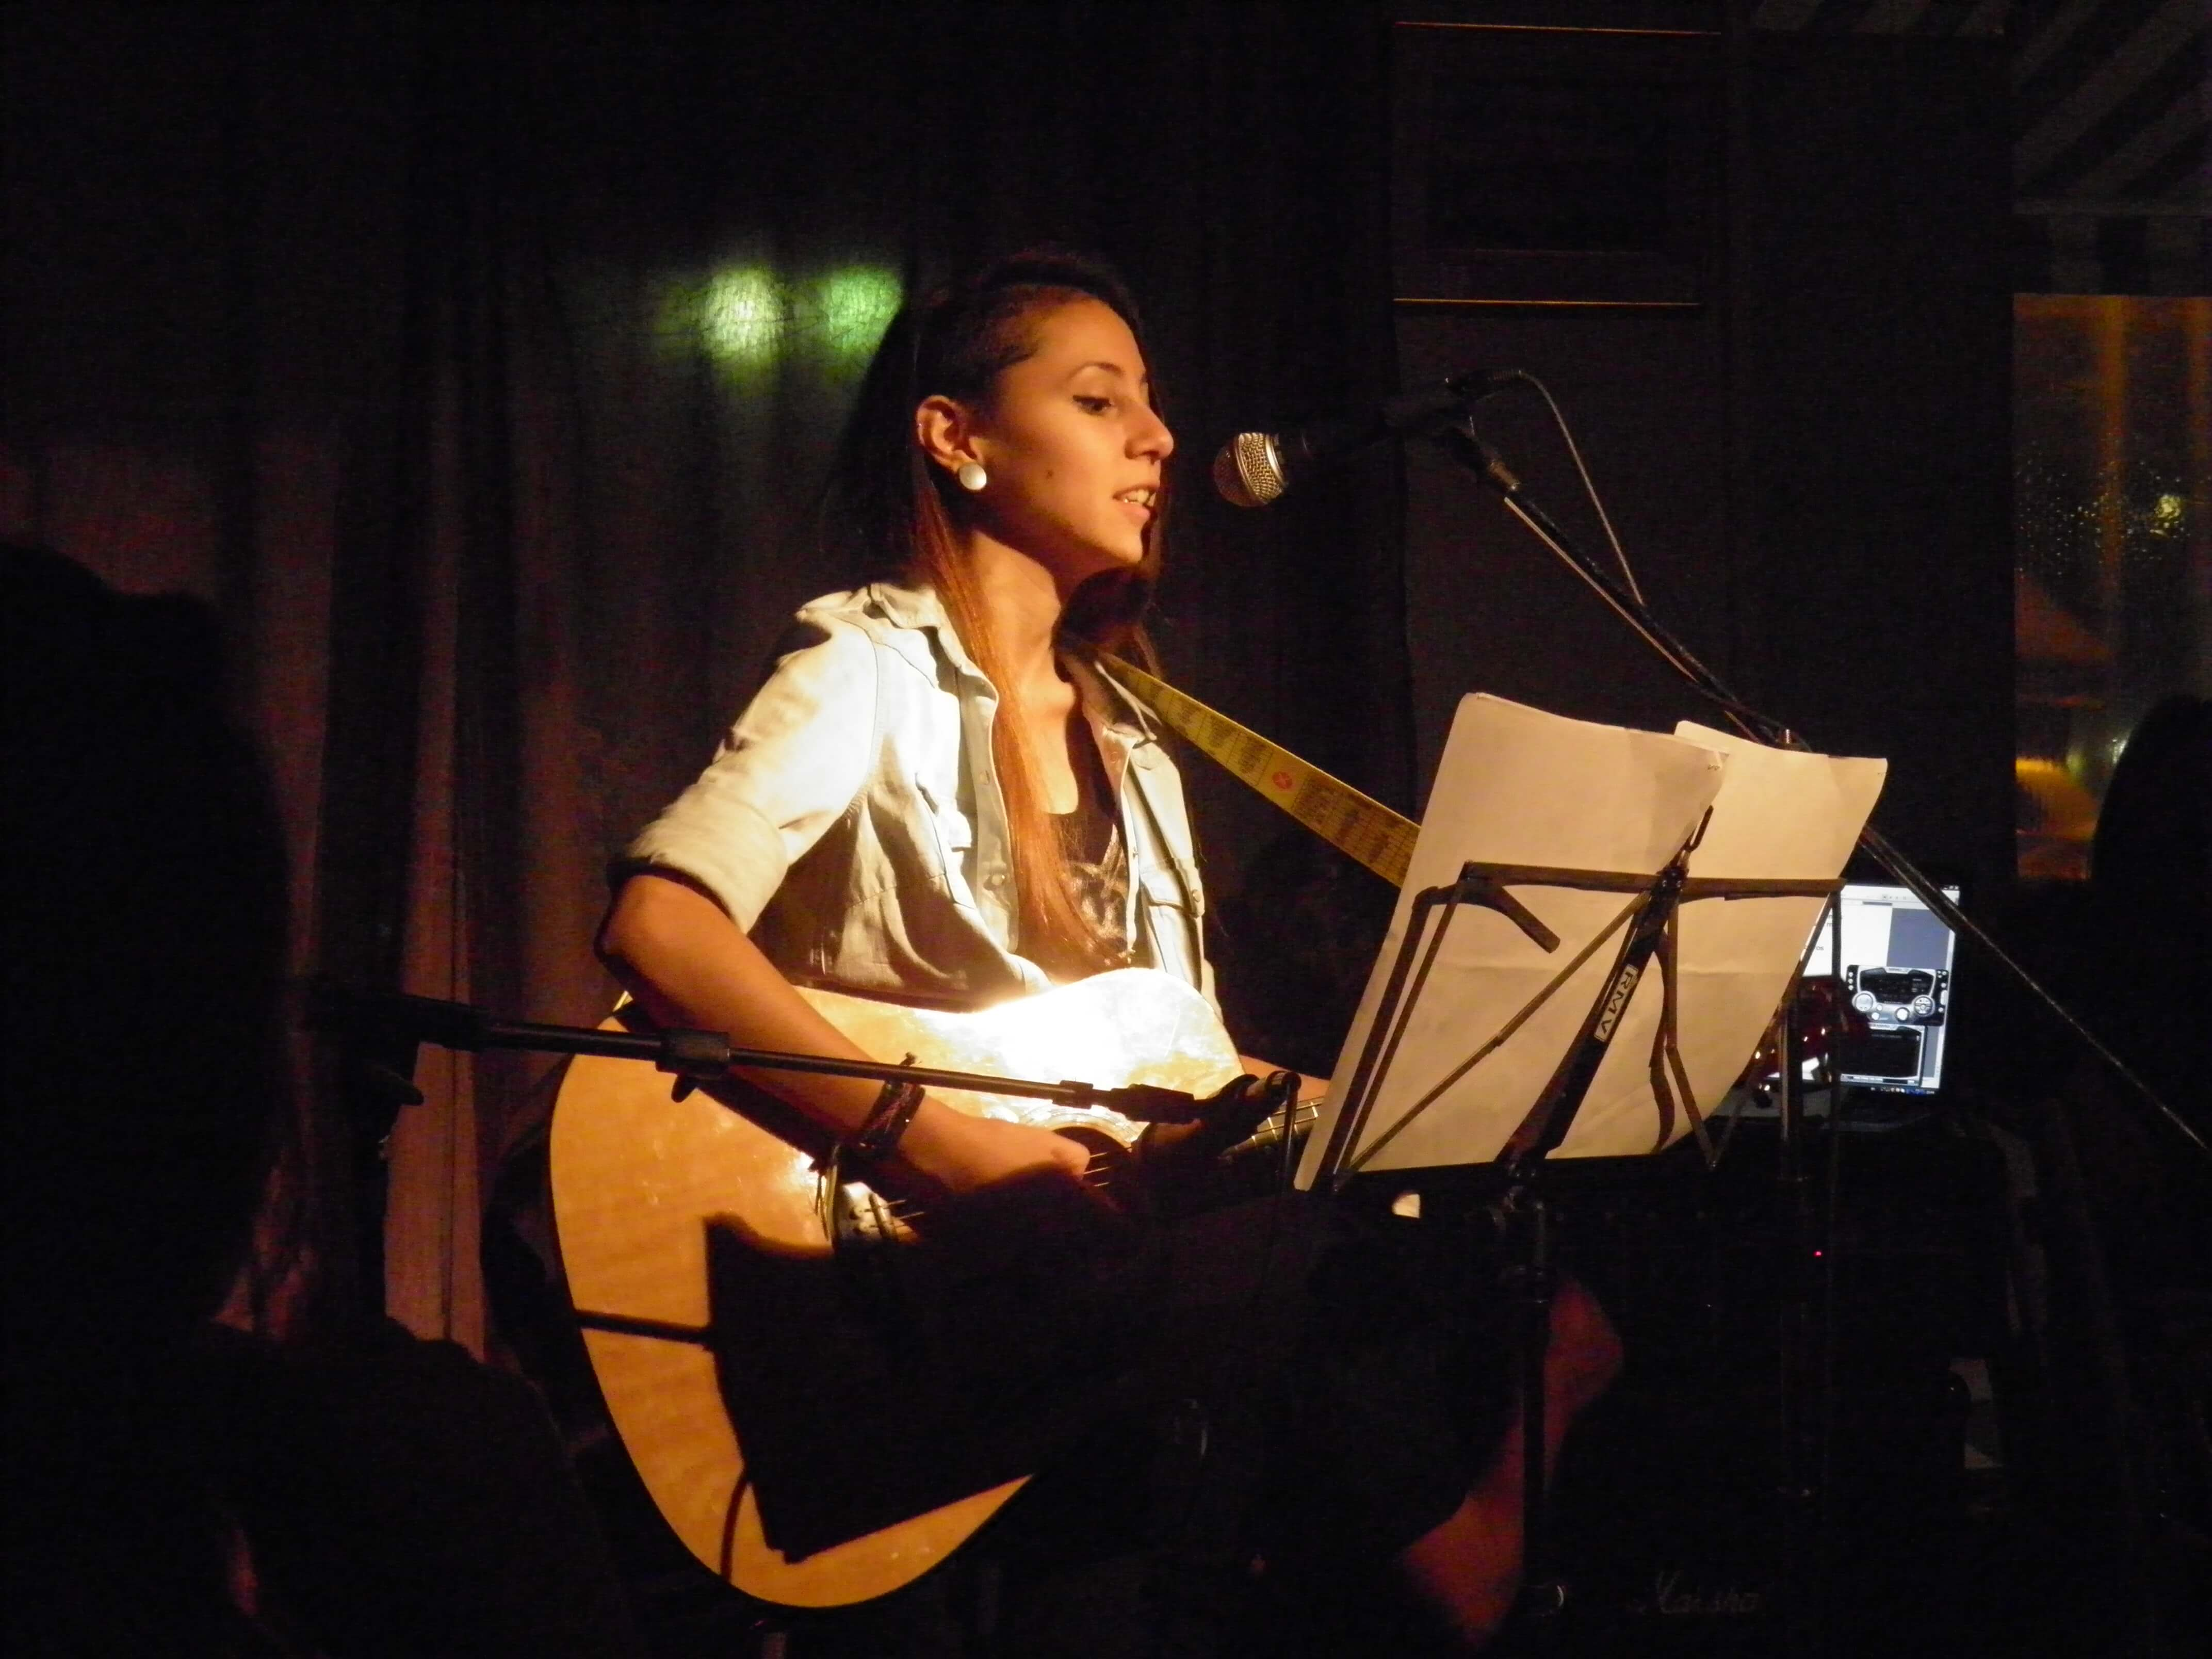 Cantante con guitarra show muestra CDC ATLA